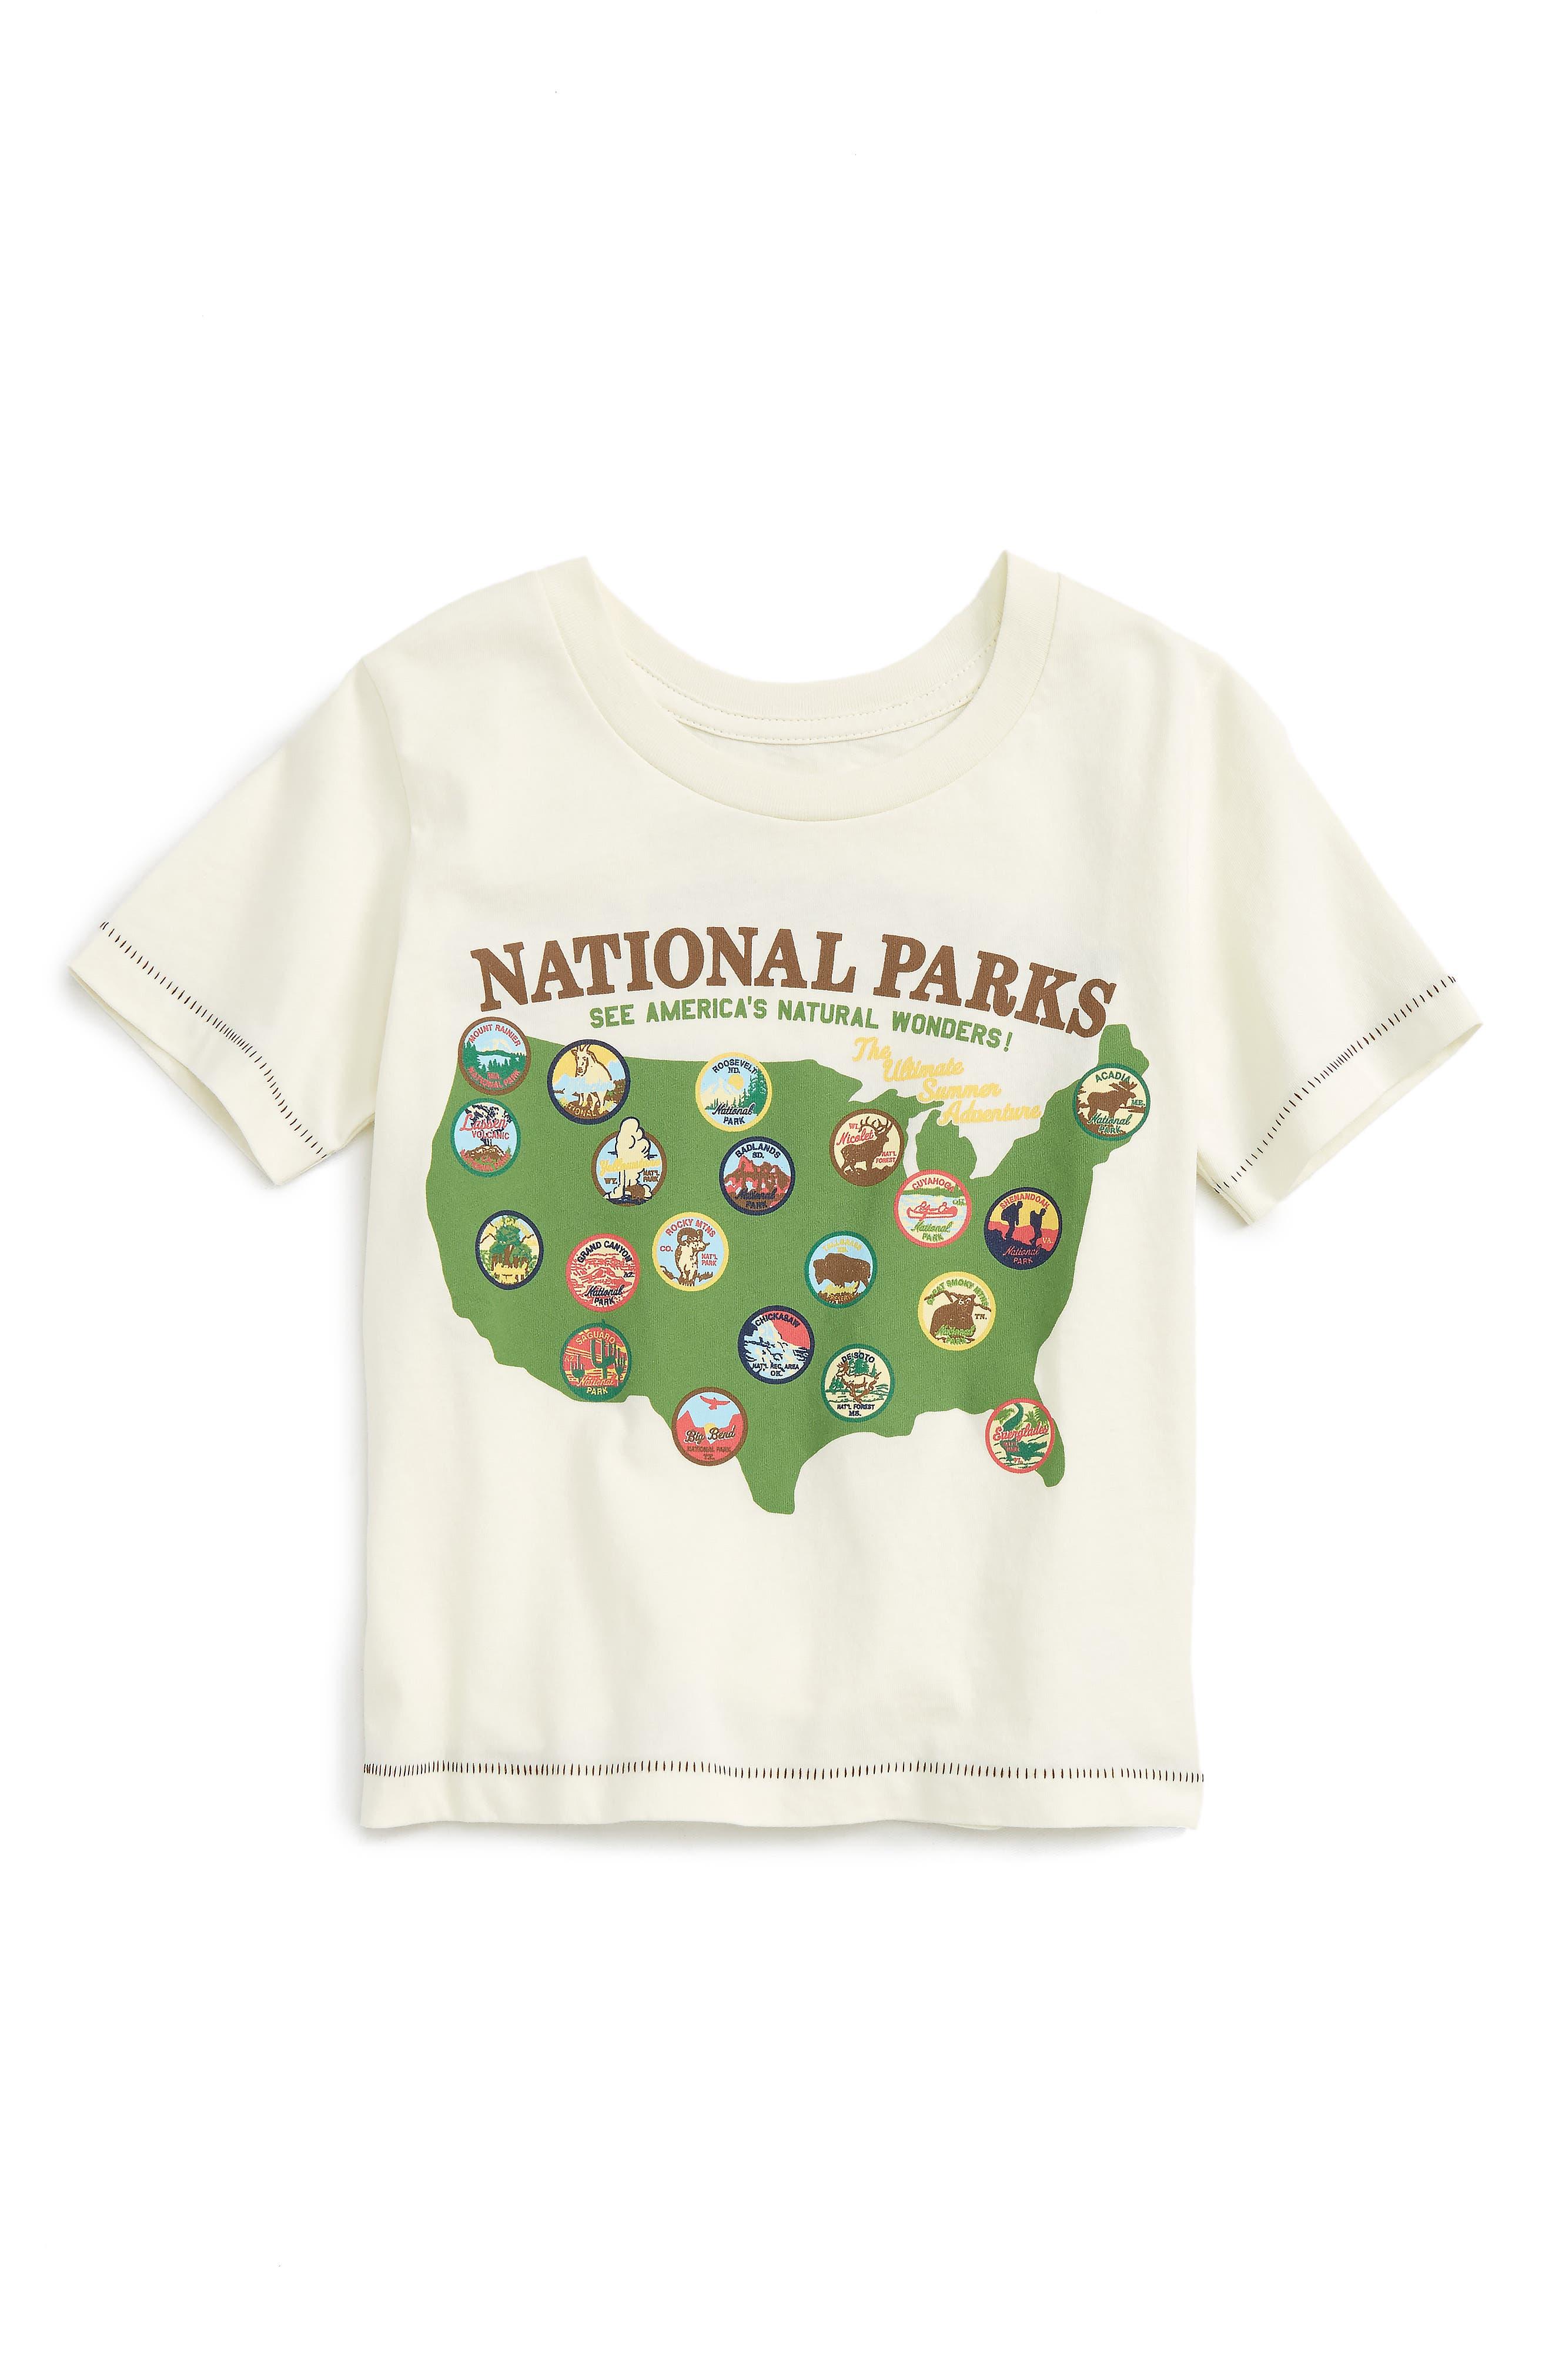 Alternate Image 1 Selected - Peek National Parks T-Shirt (Toddler Kids, Little Kids & Big Kids)